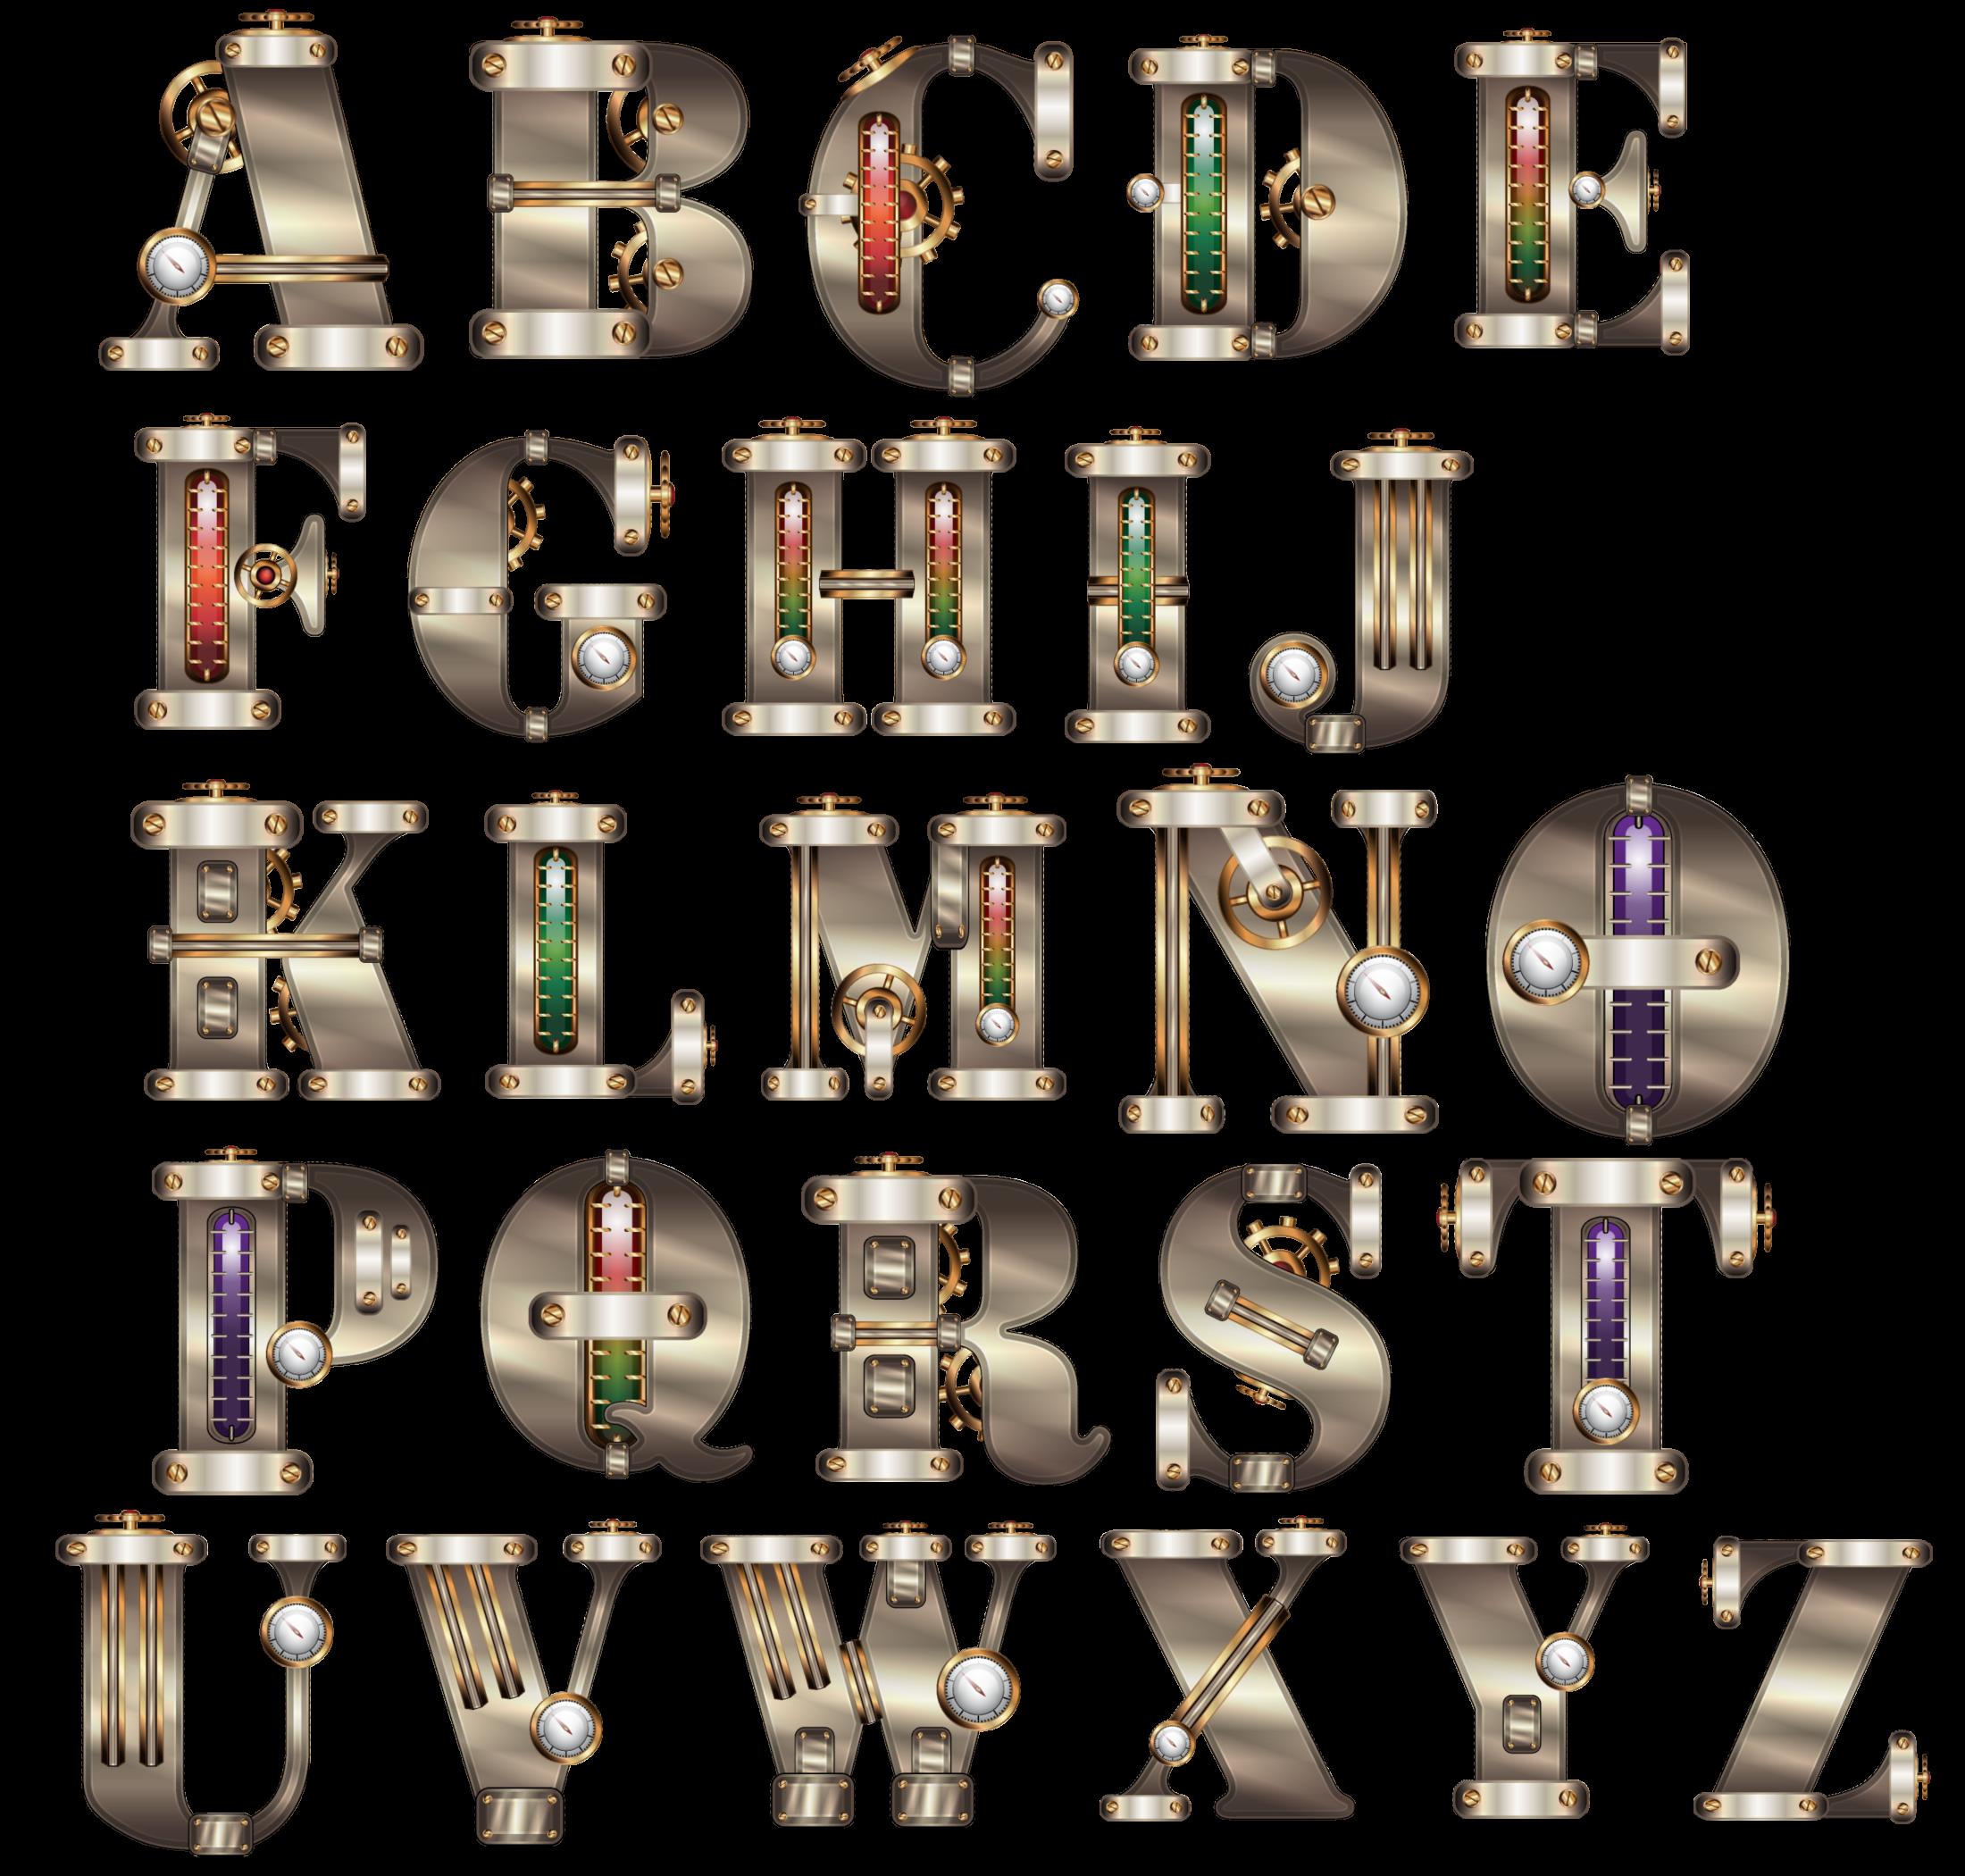 Steampunk clipart alphabet. Gimp chat phf file